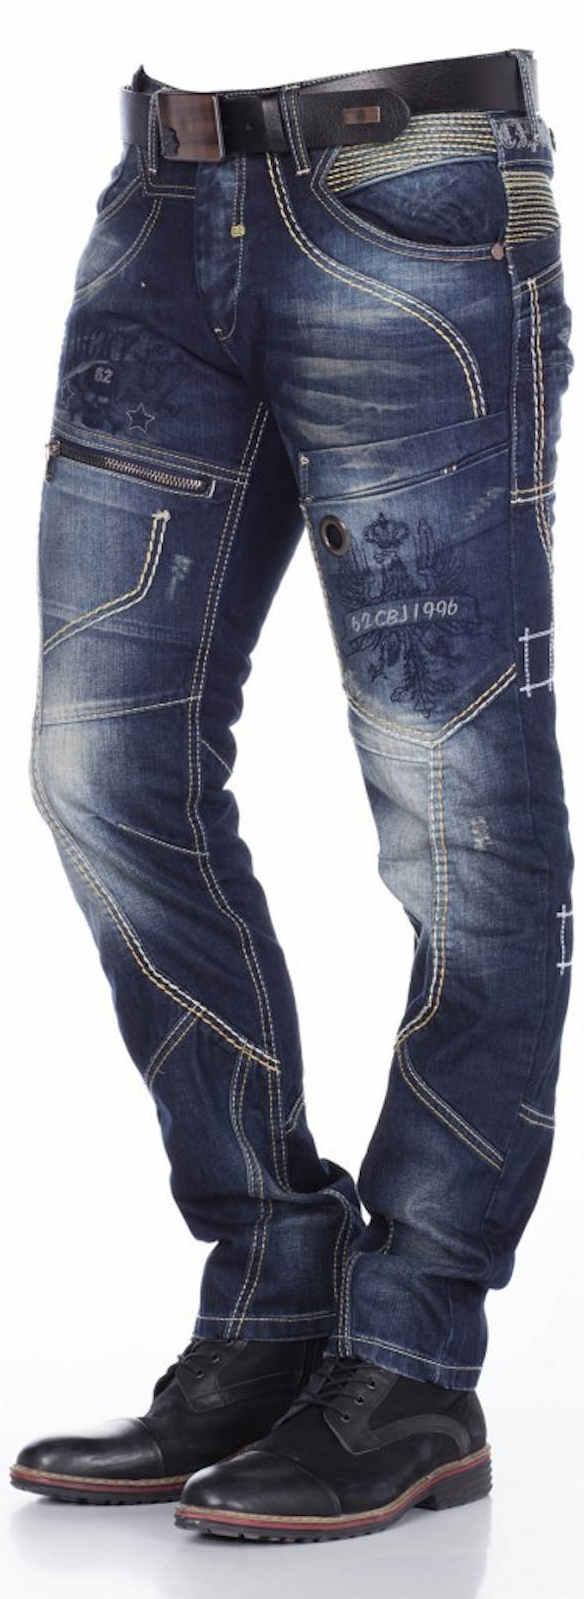 Cipo-amp-Baxx-Men-039-s-Jeans-c-1114-New-Trousers-Straight-Cut-Regular-Straight-Leg-Denim thumbnail 3